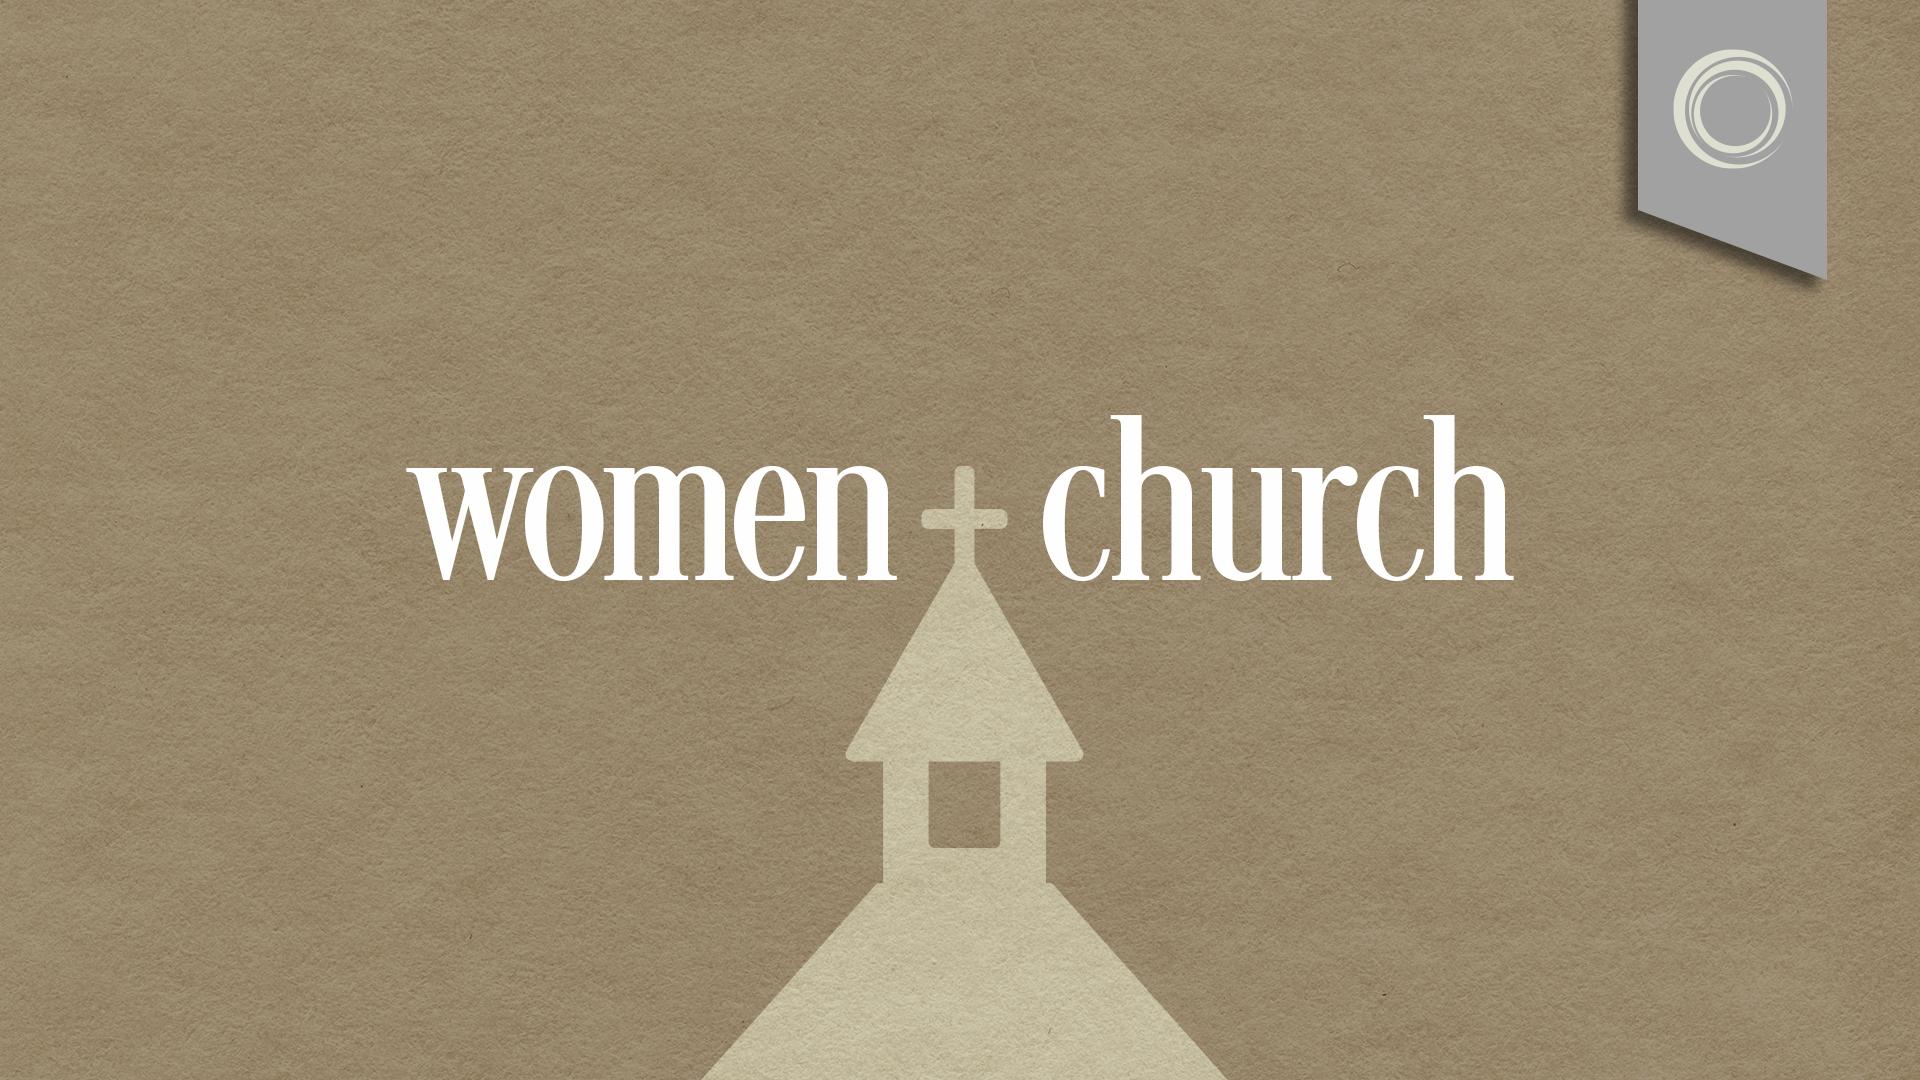 2019_women_church_title_slide.jpg